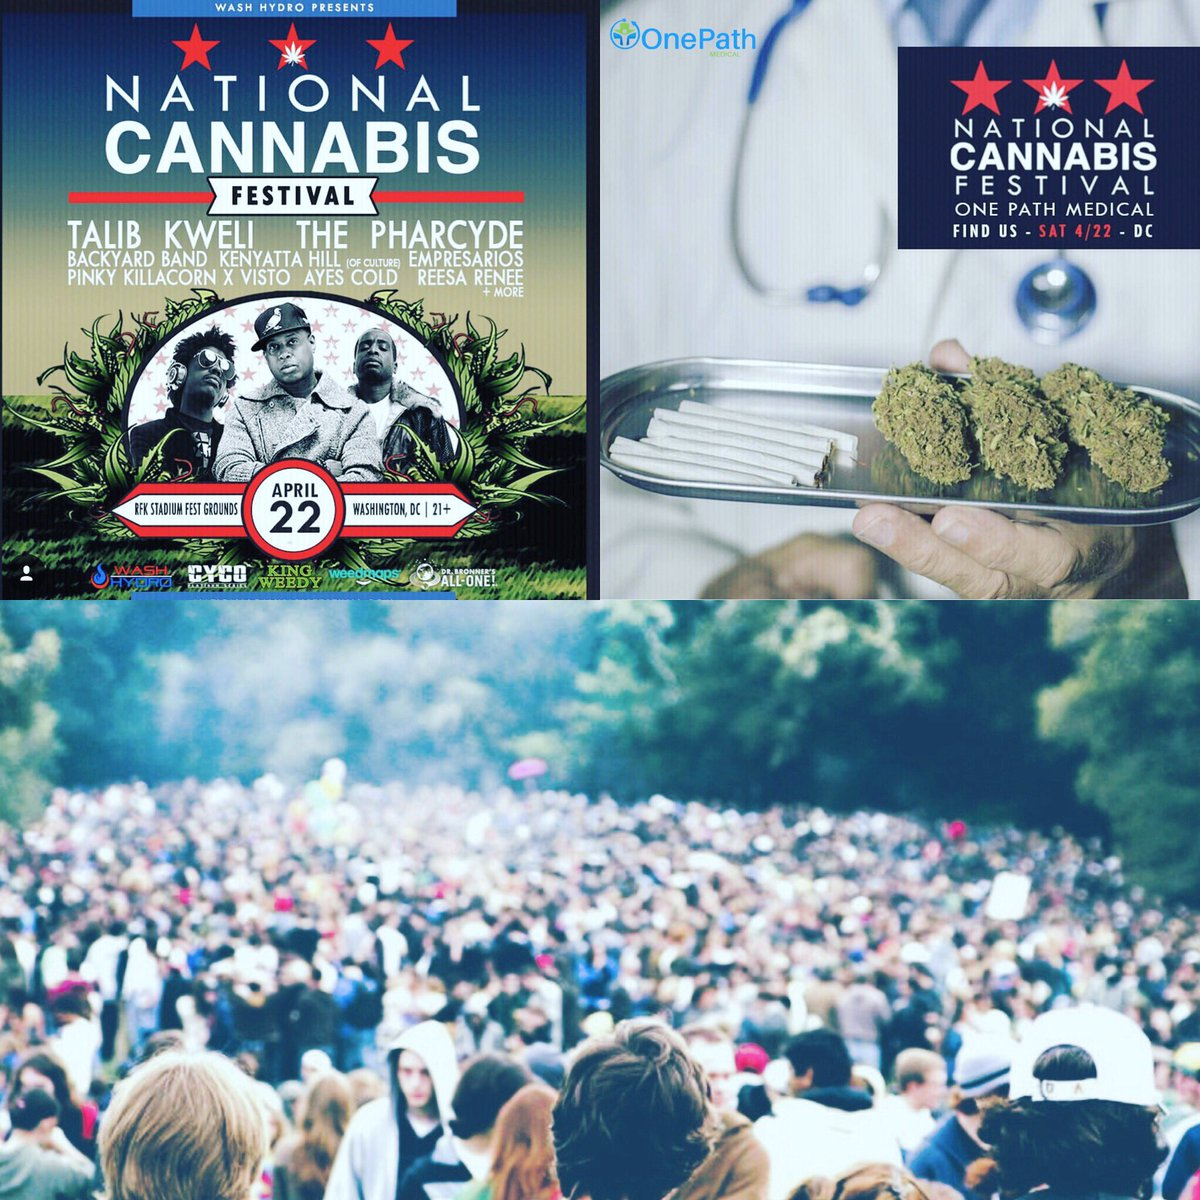 nationalcannabisfestival hashtag on twitter